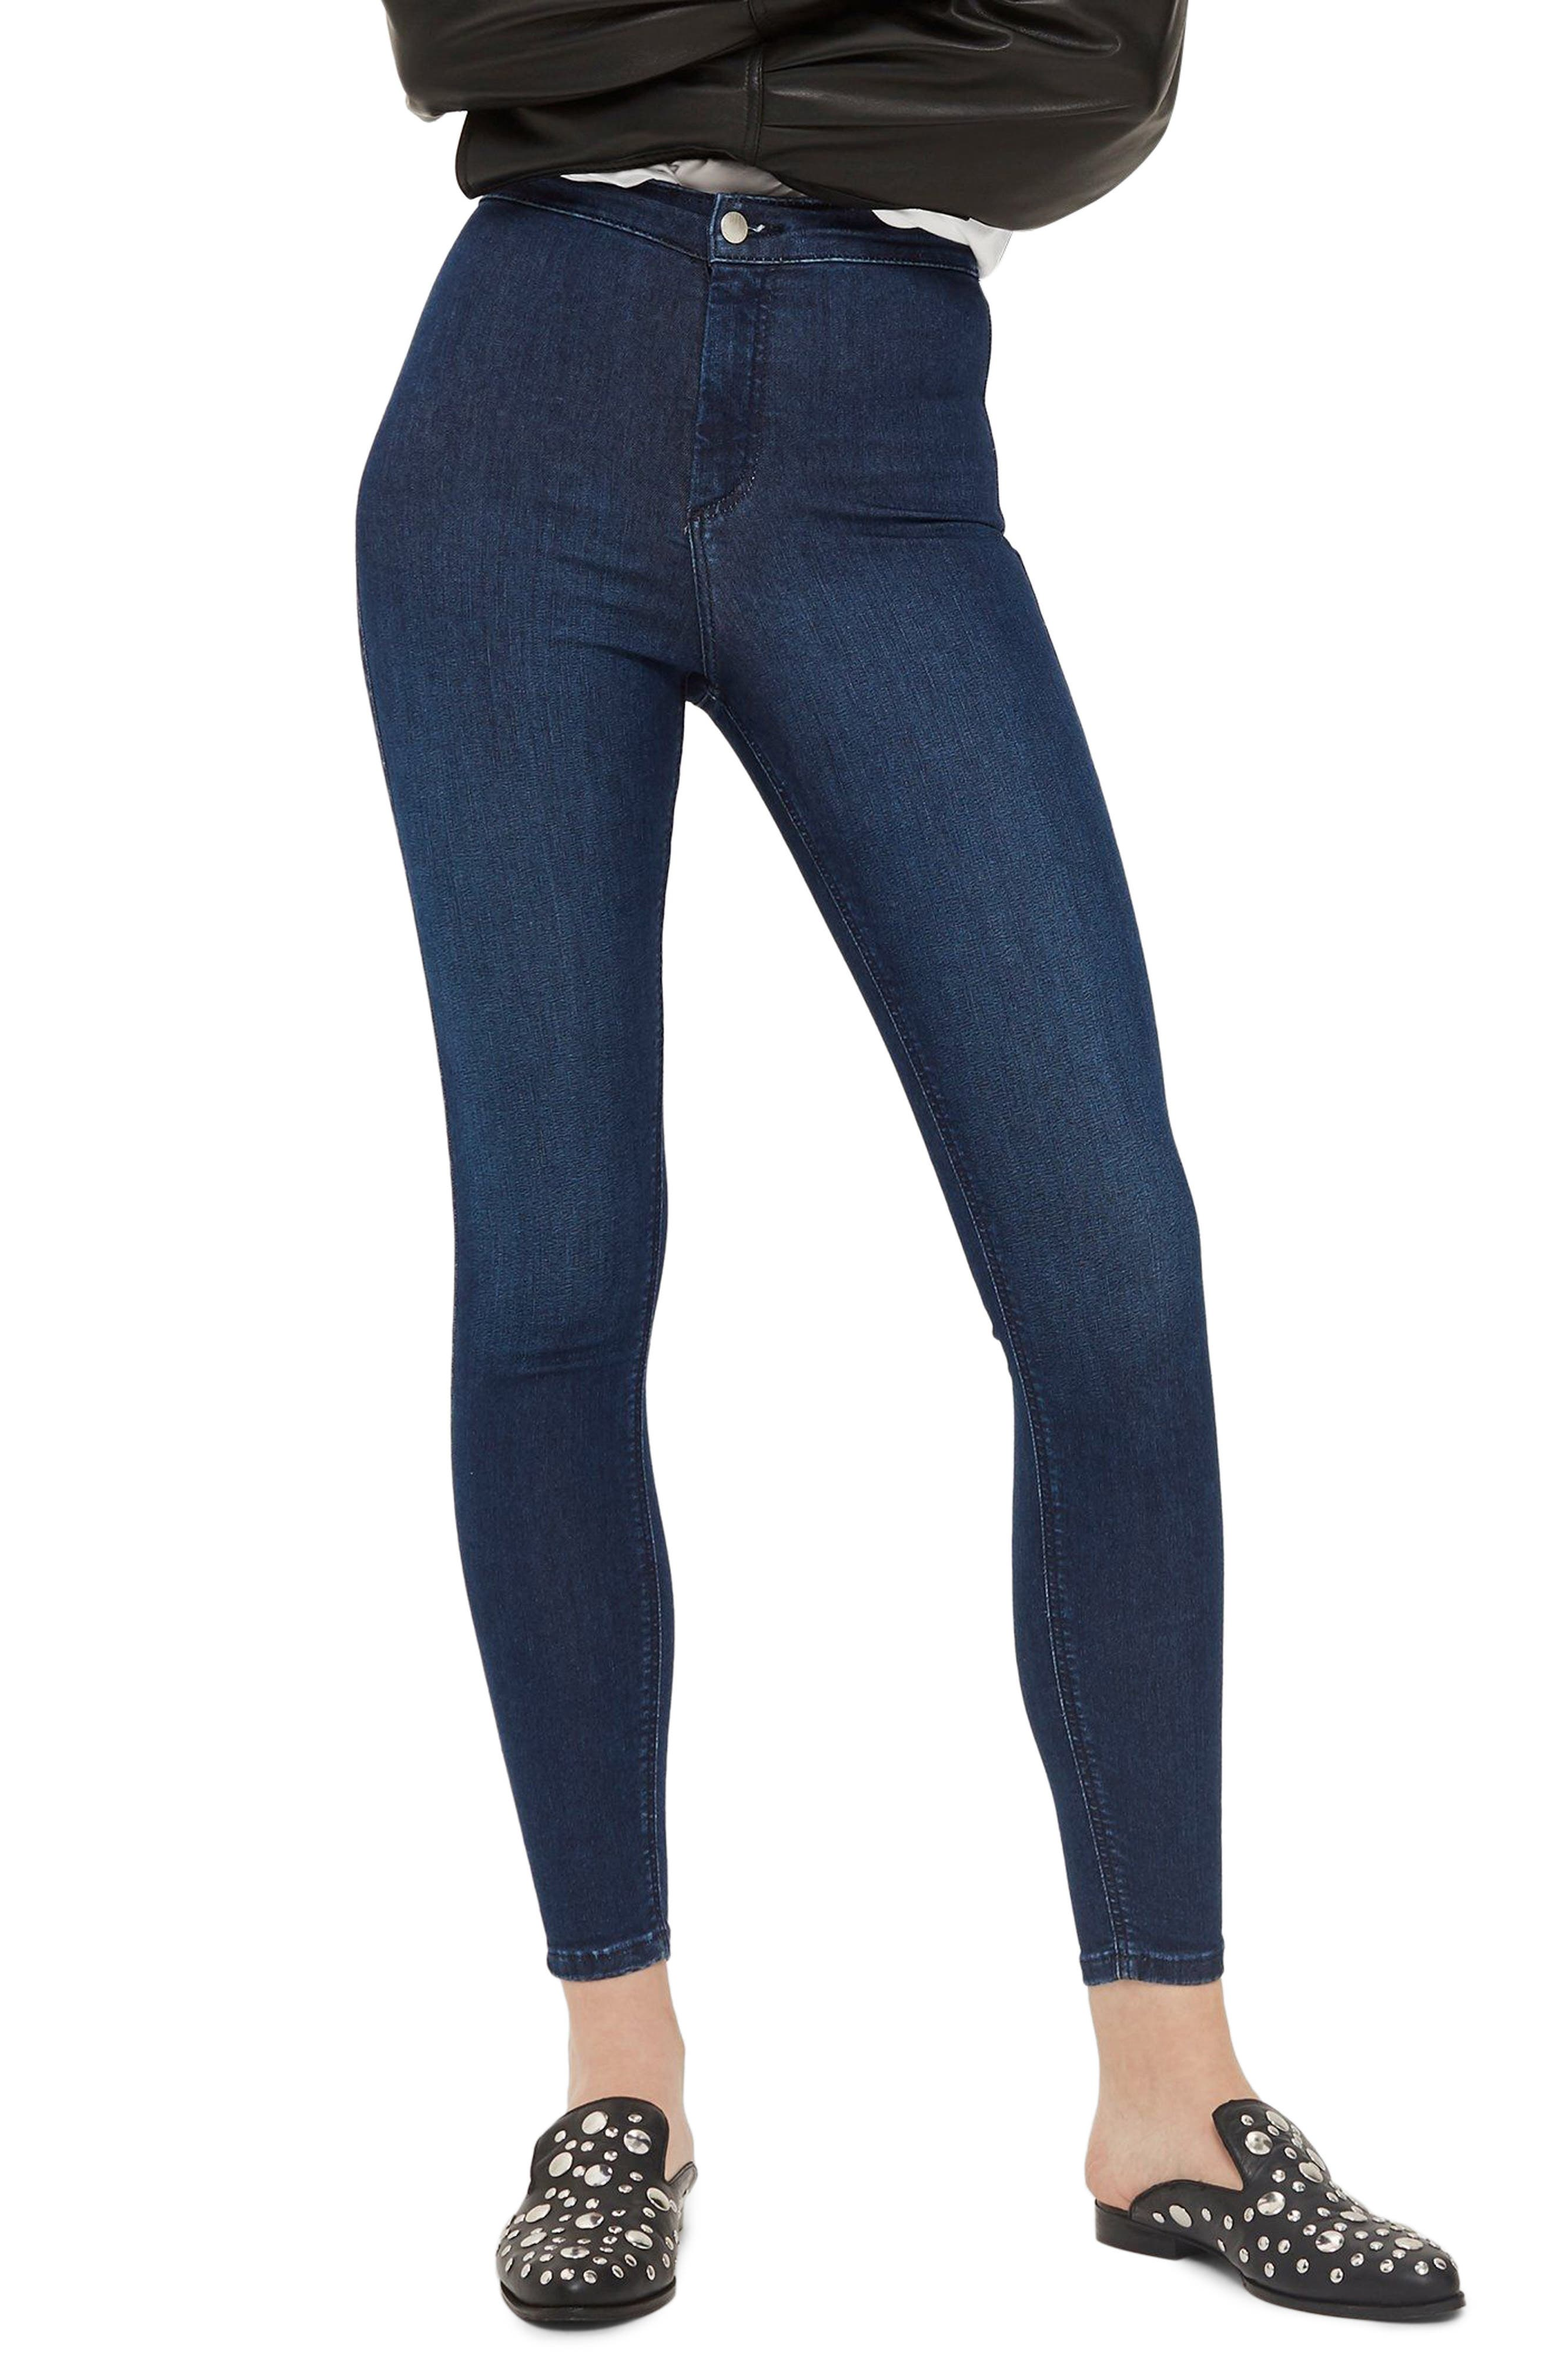 Joni Petite Jeans,                         Main,                         color, Indigo